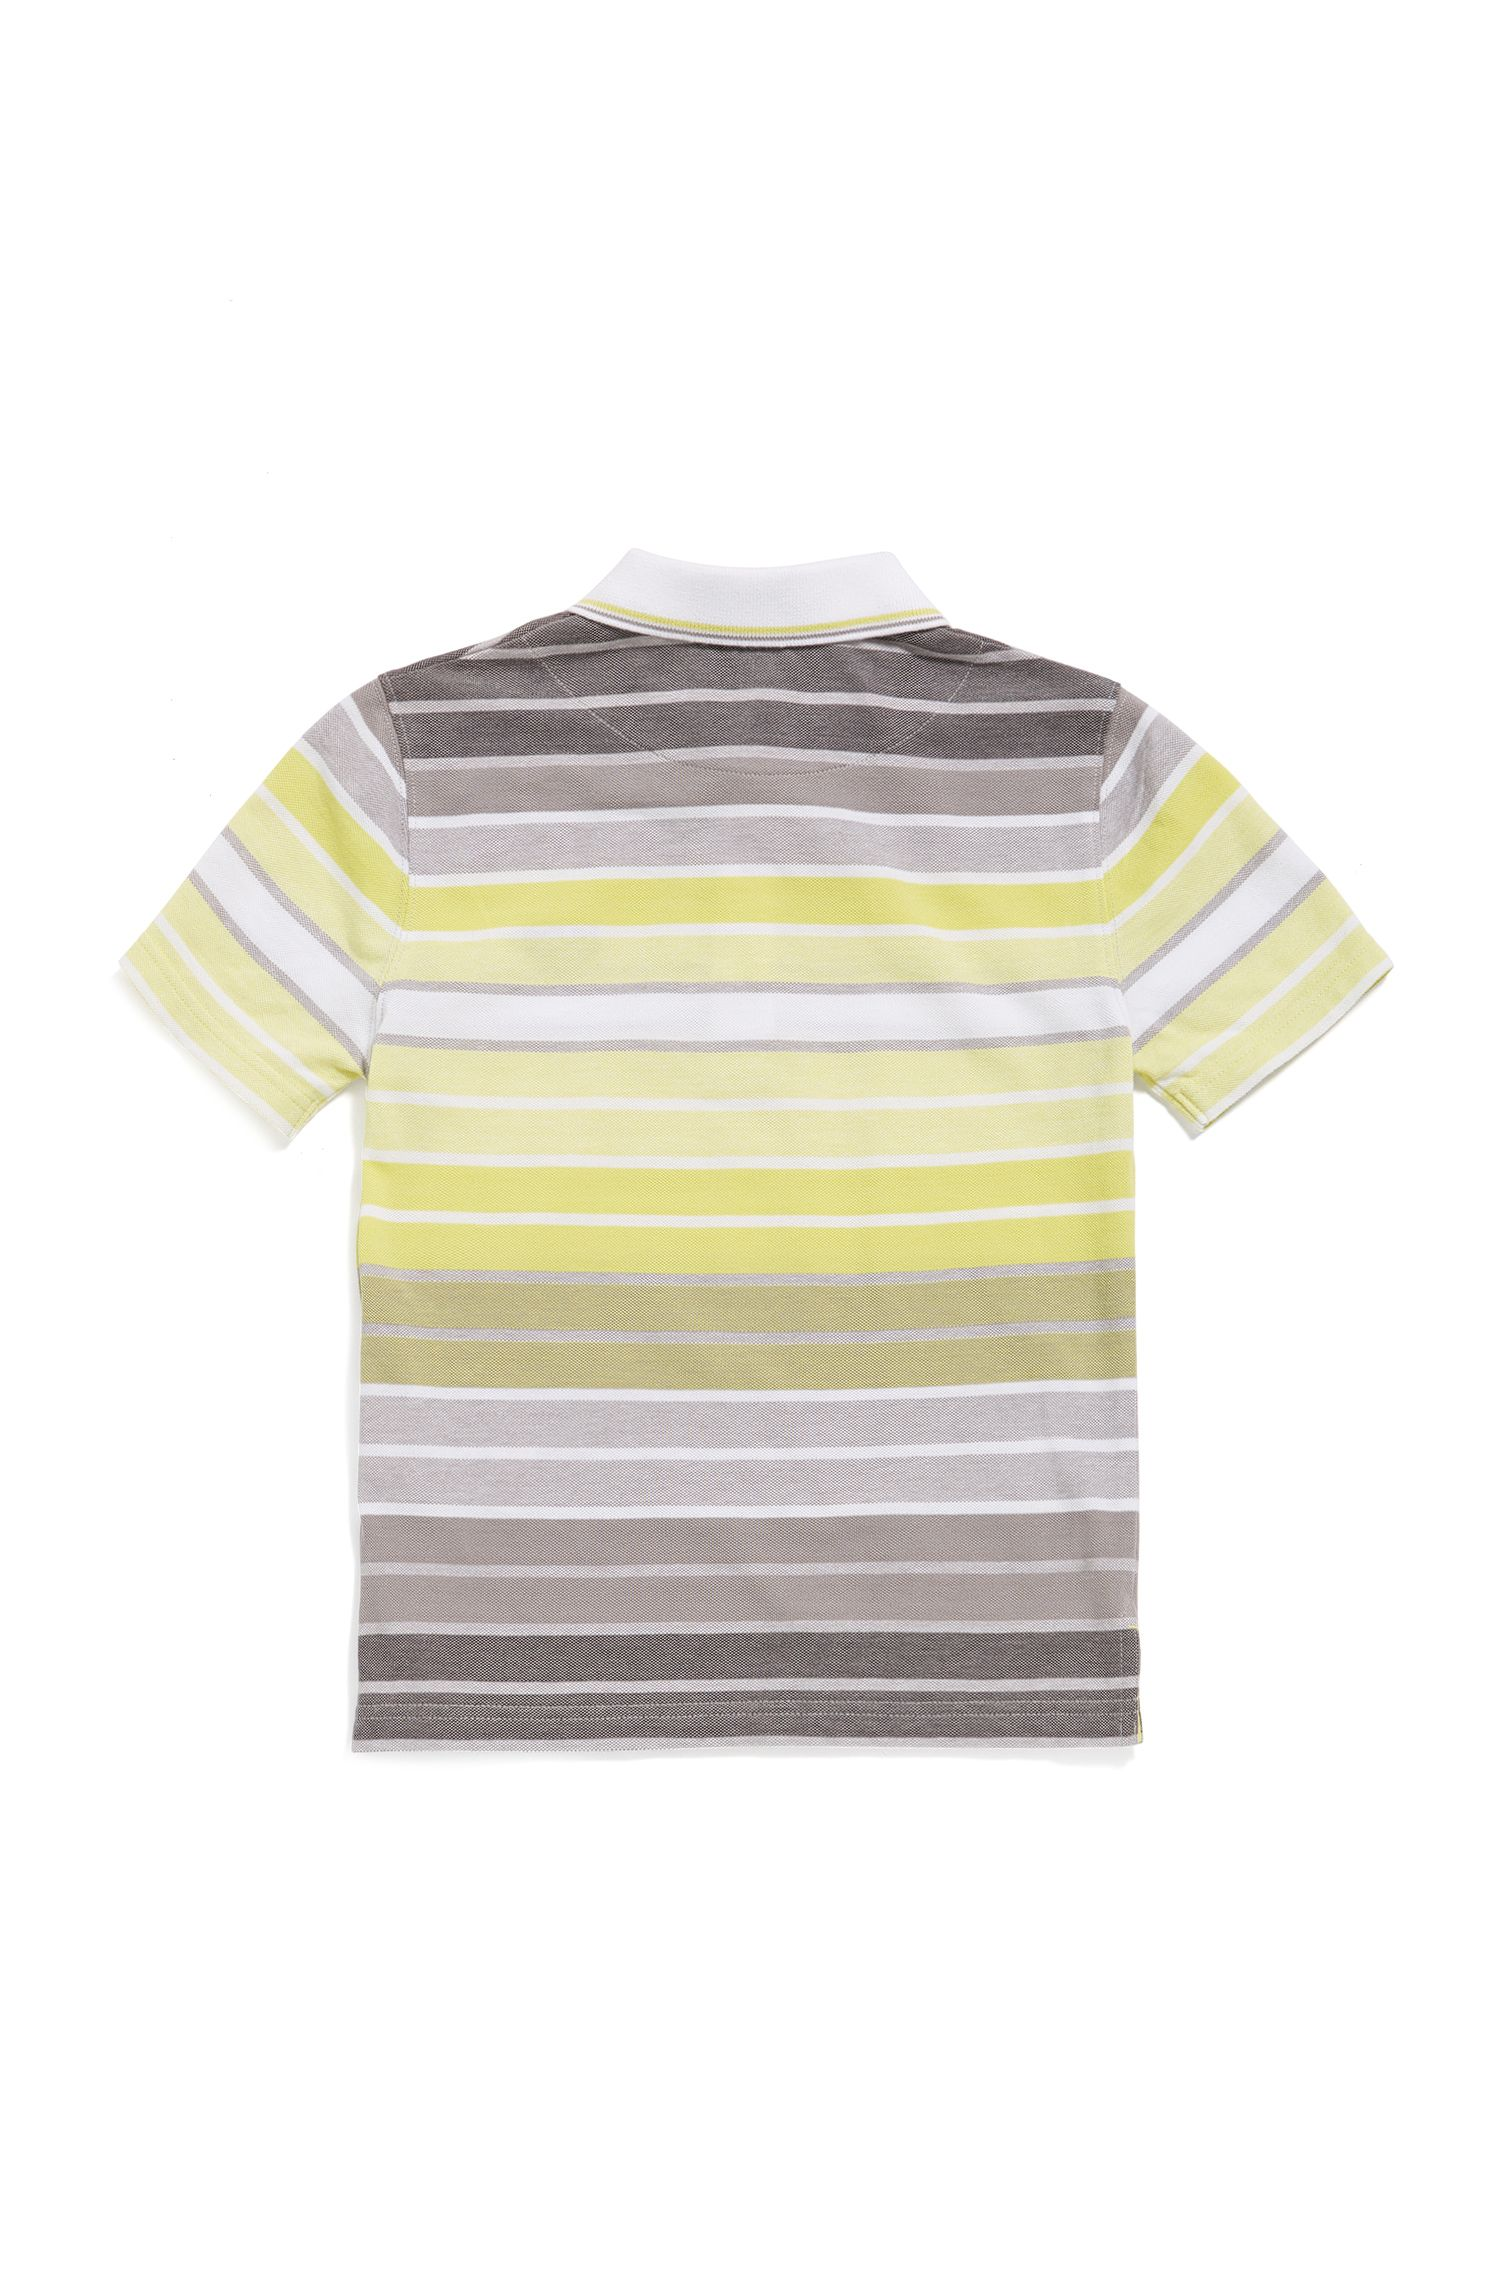 Kids-Poloshirt aus Baumwolle im gestreiften Dessin: 'J25A70'